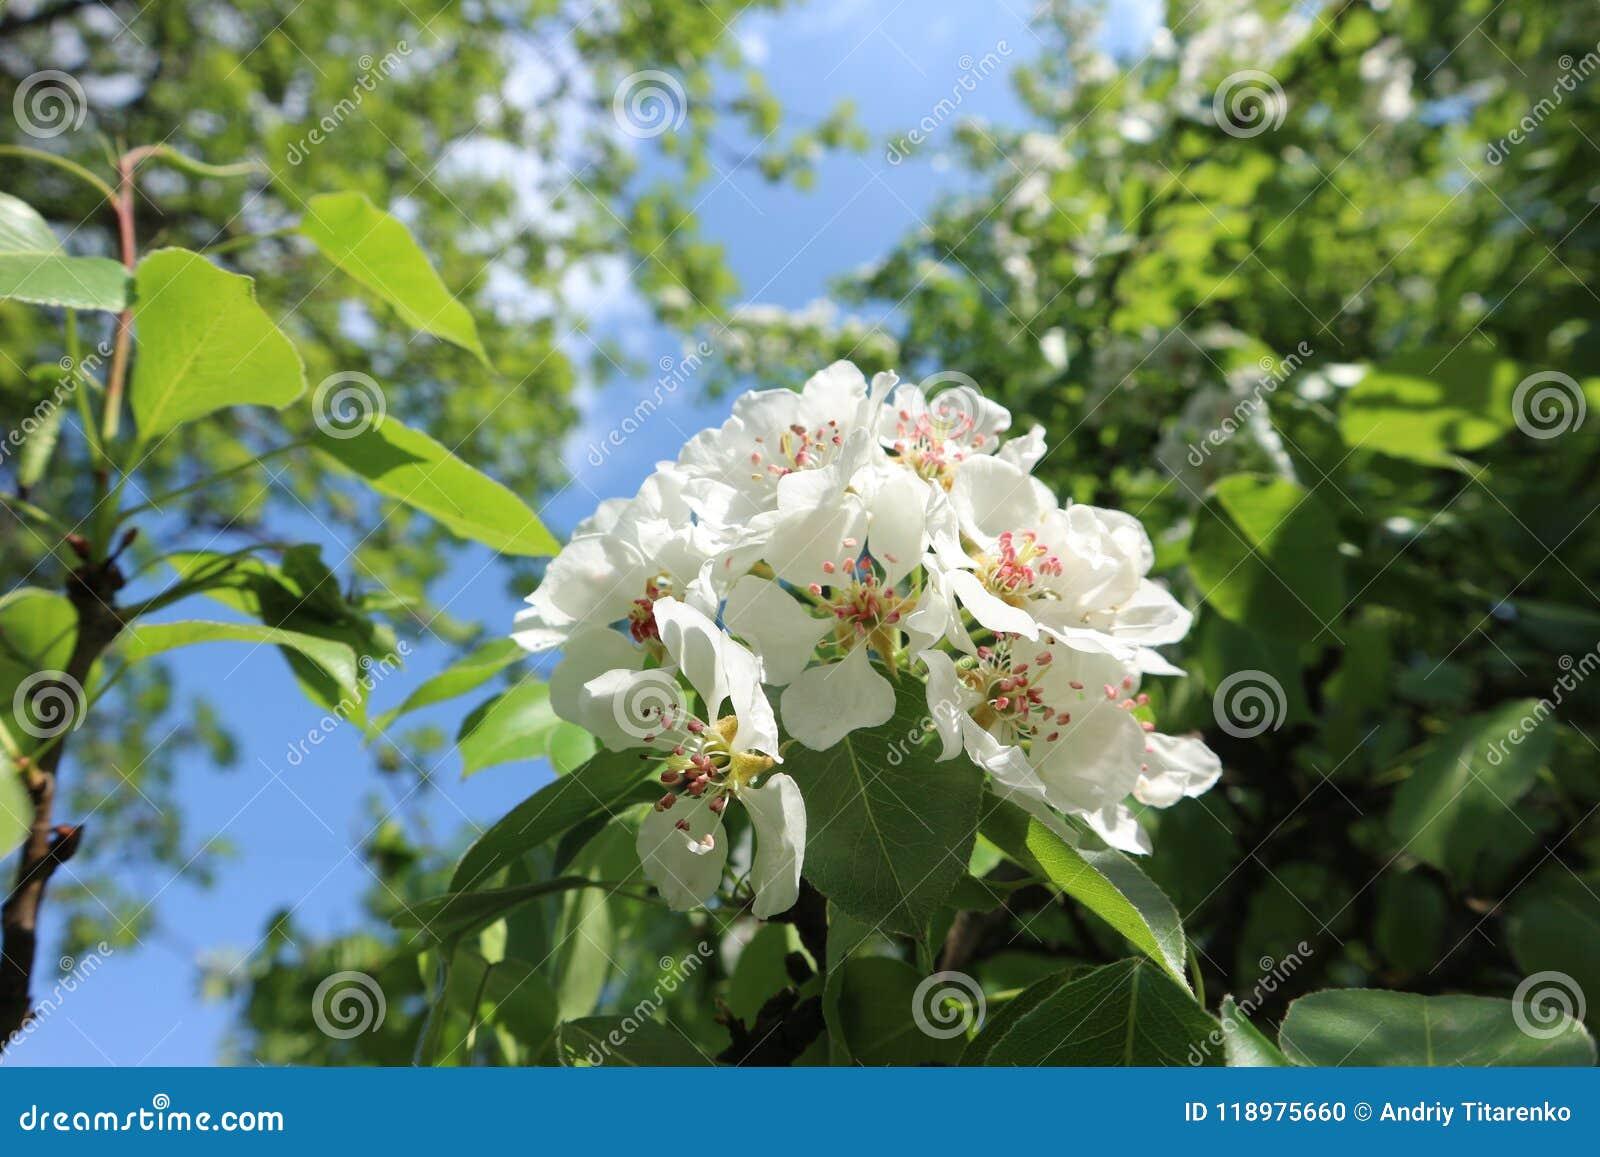 Blossoming дерево весной